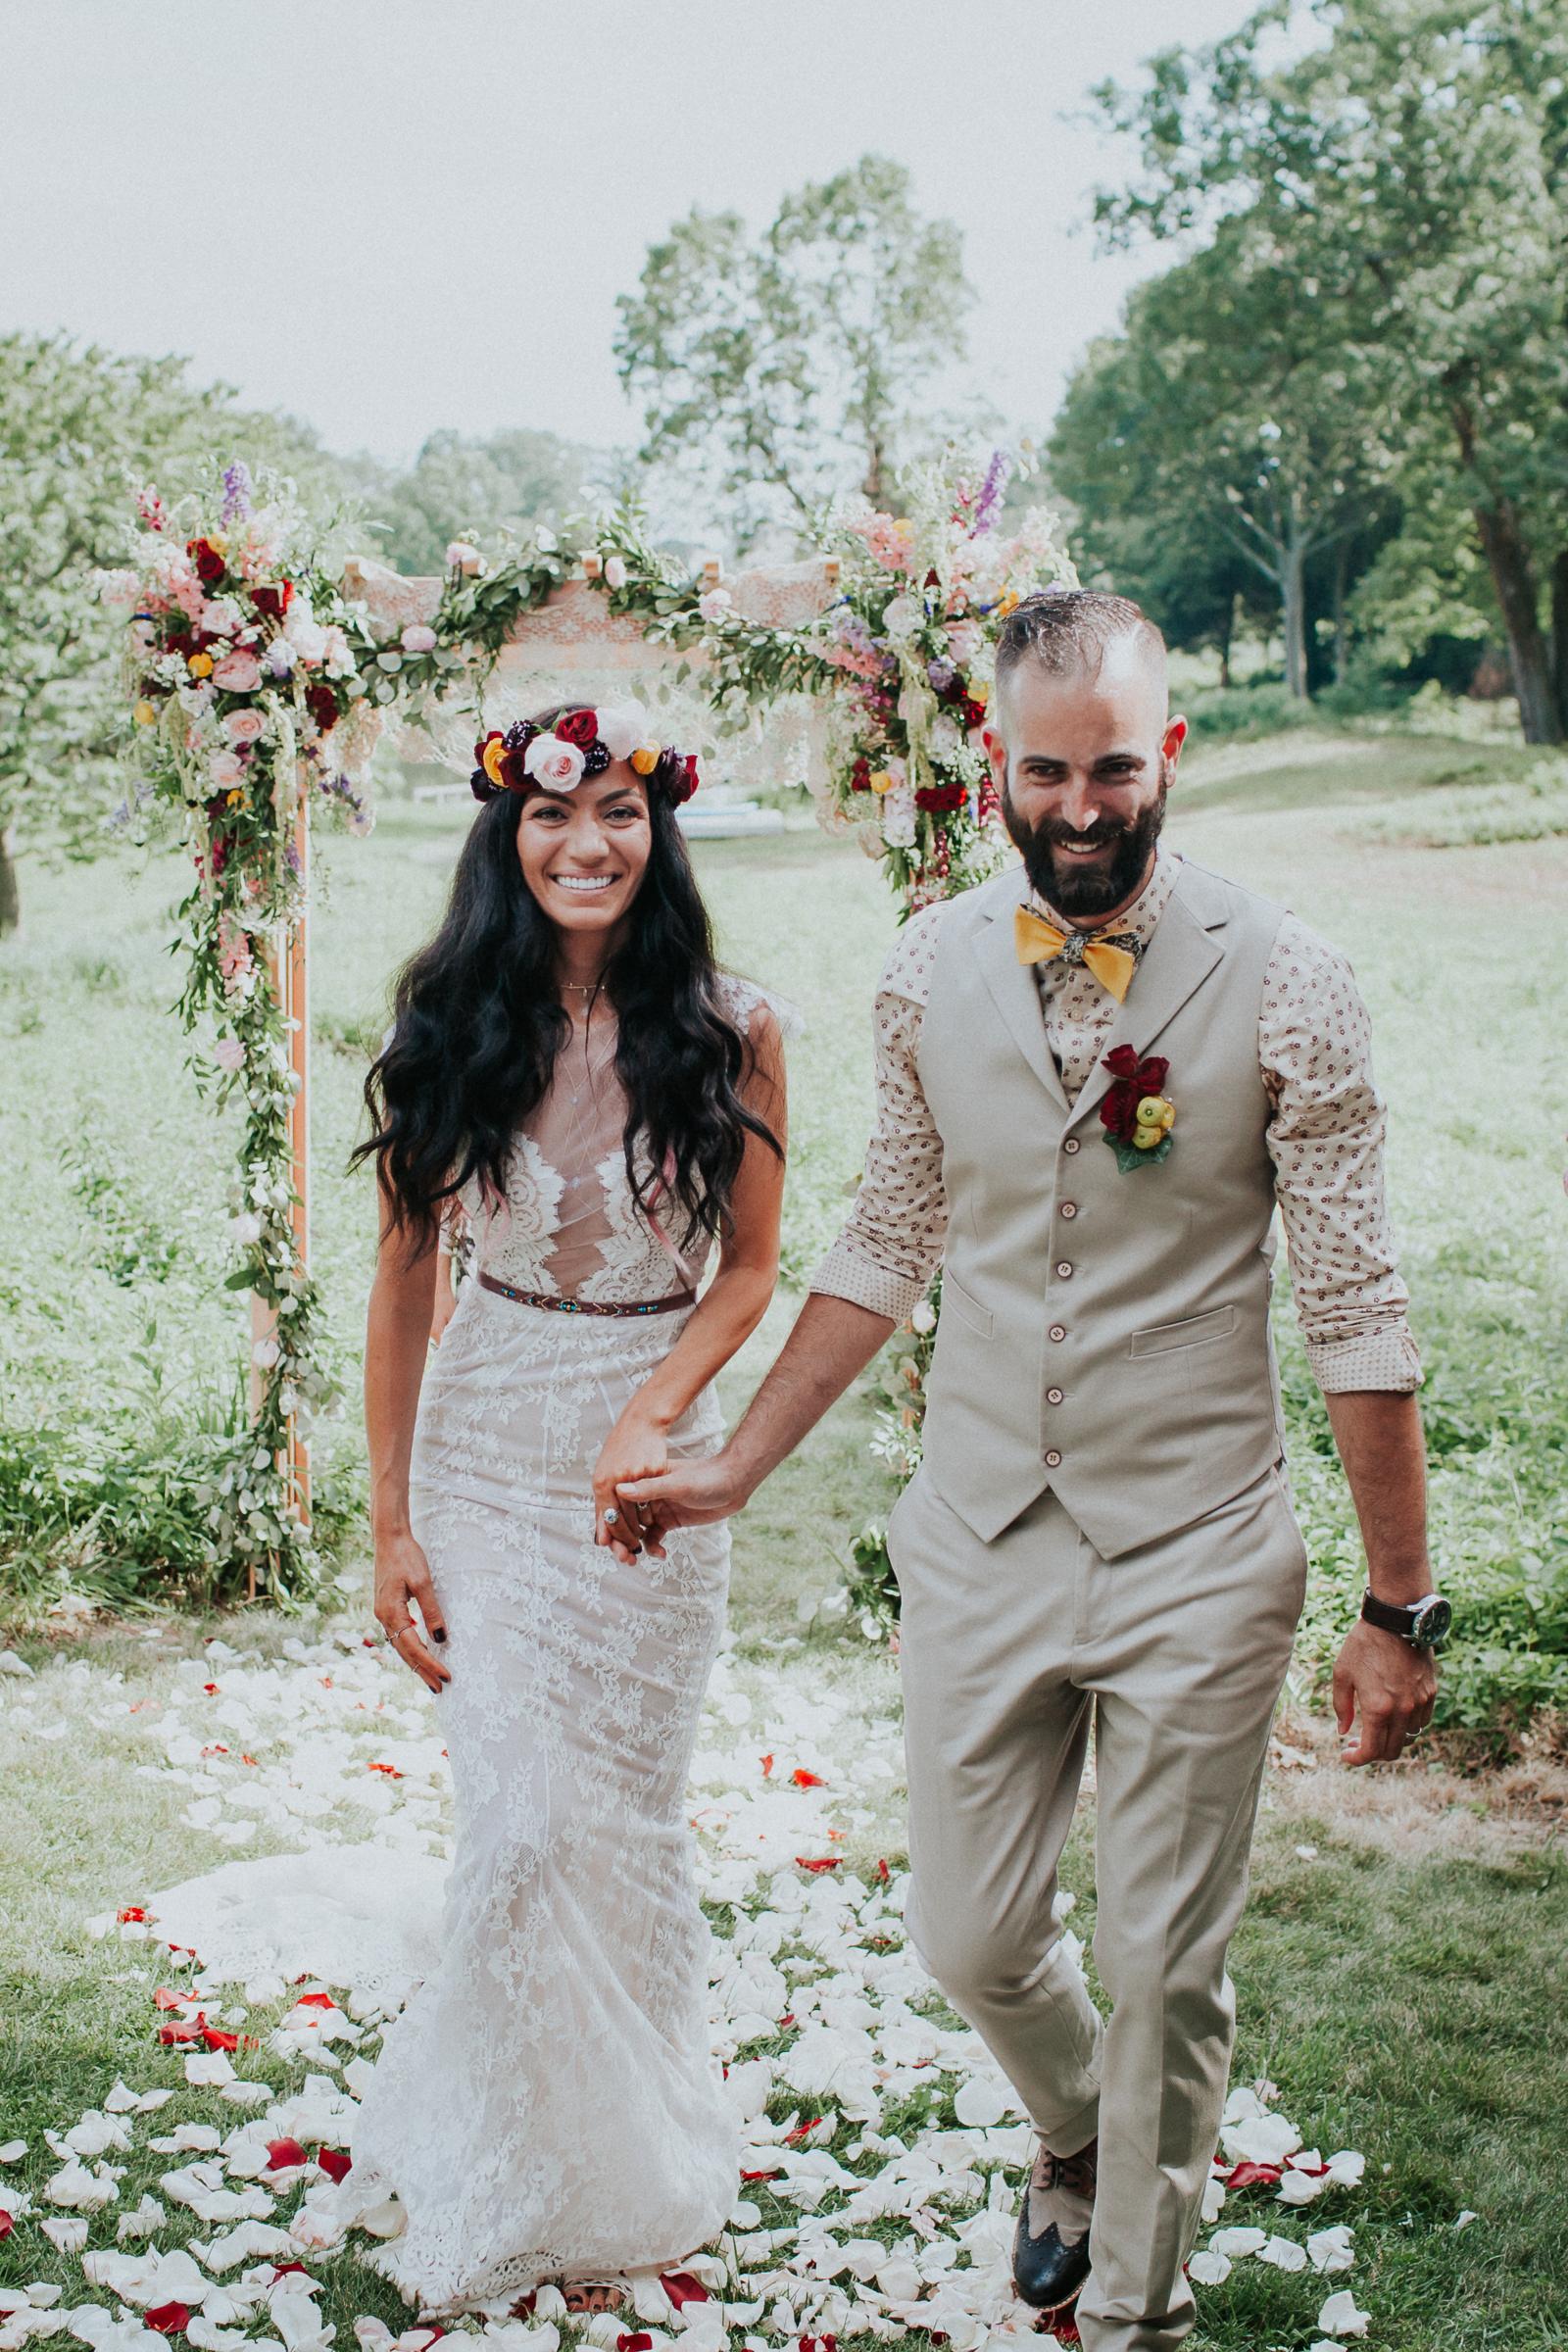 Backyard-Intimate-Adventurous-Destination-Wedding-Darien-Connecticut-Documentary-Wedding-Photography-61.jpg